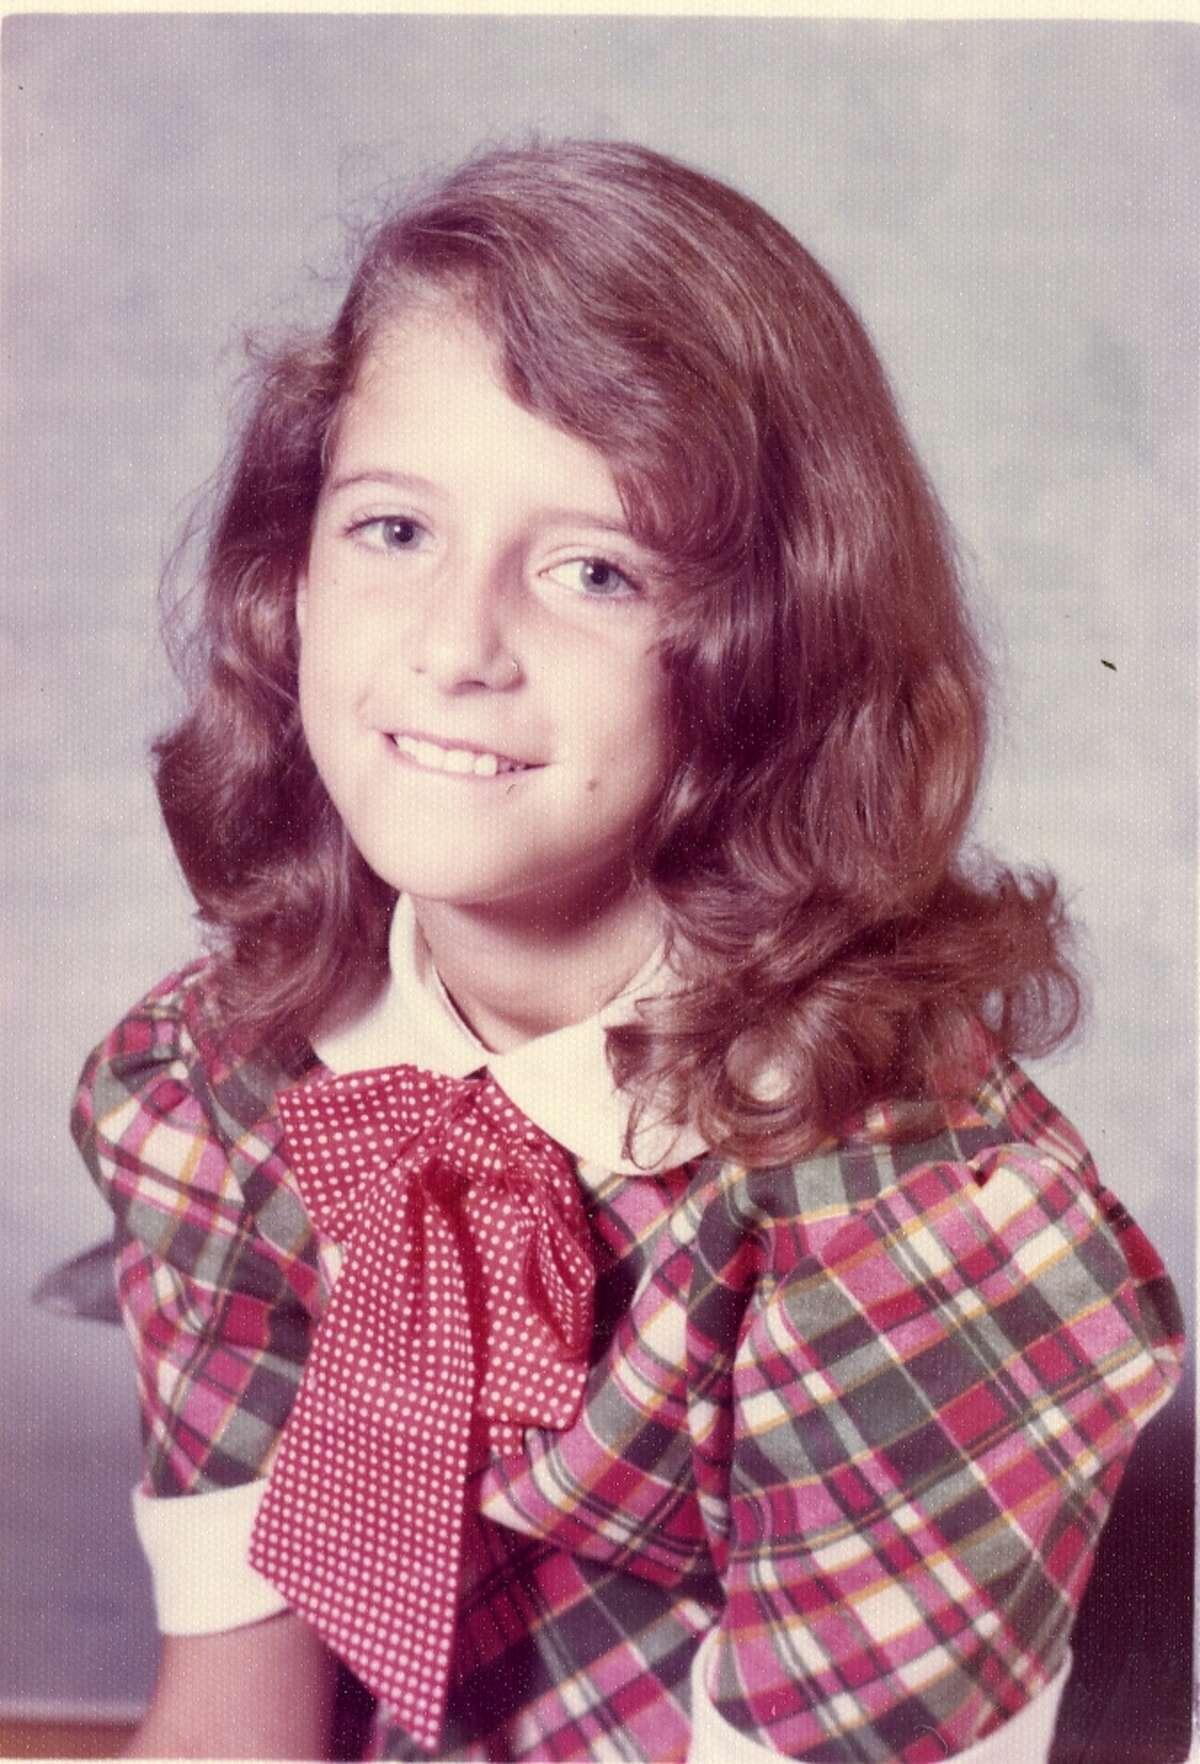 Wendy Davis as a child in grade school.